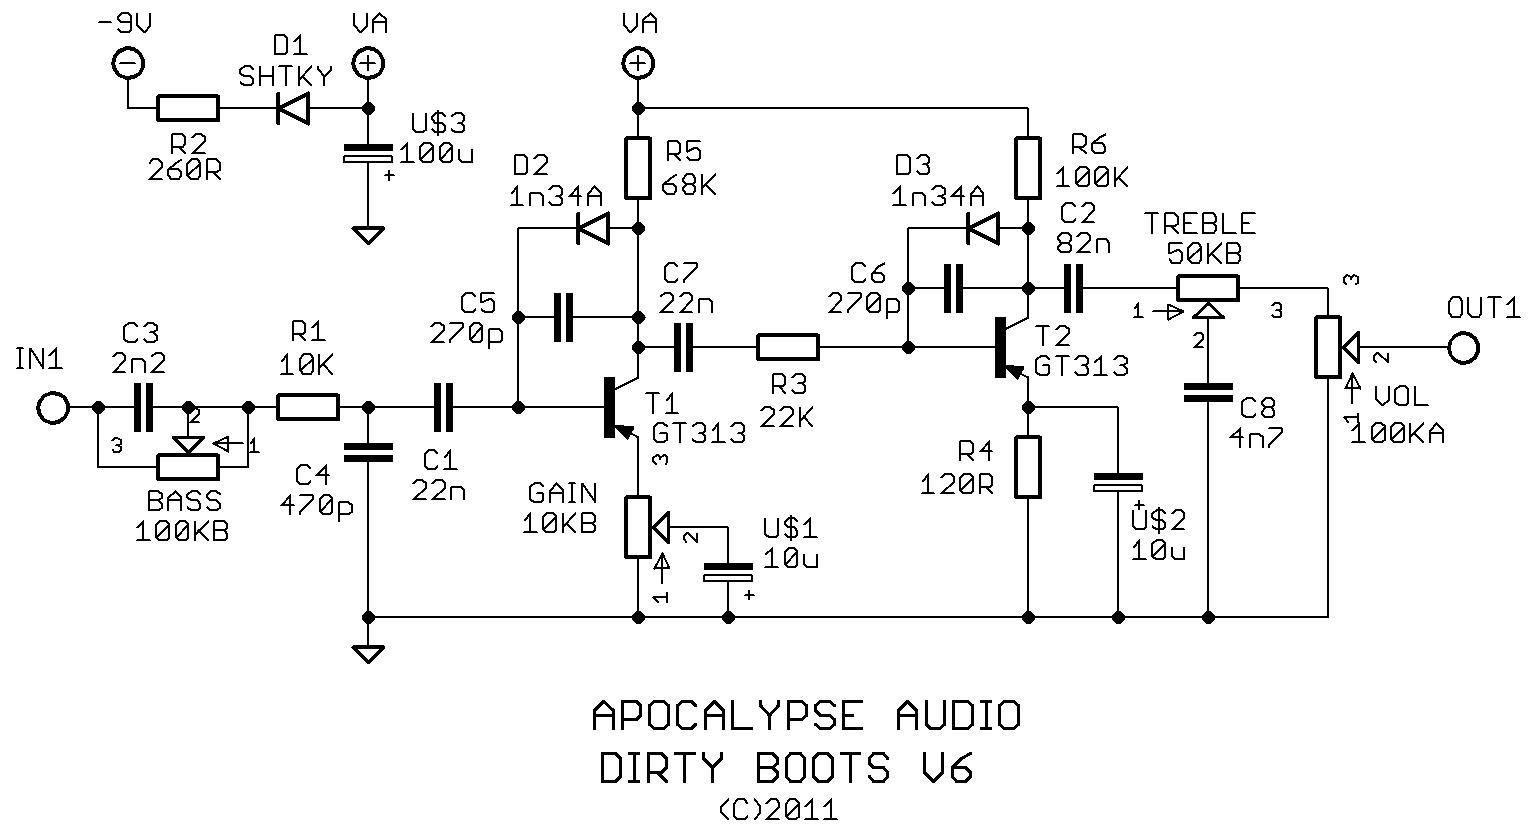 apocalypse audio  dirty boots v6